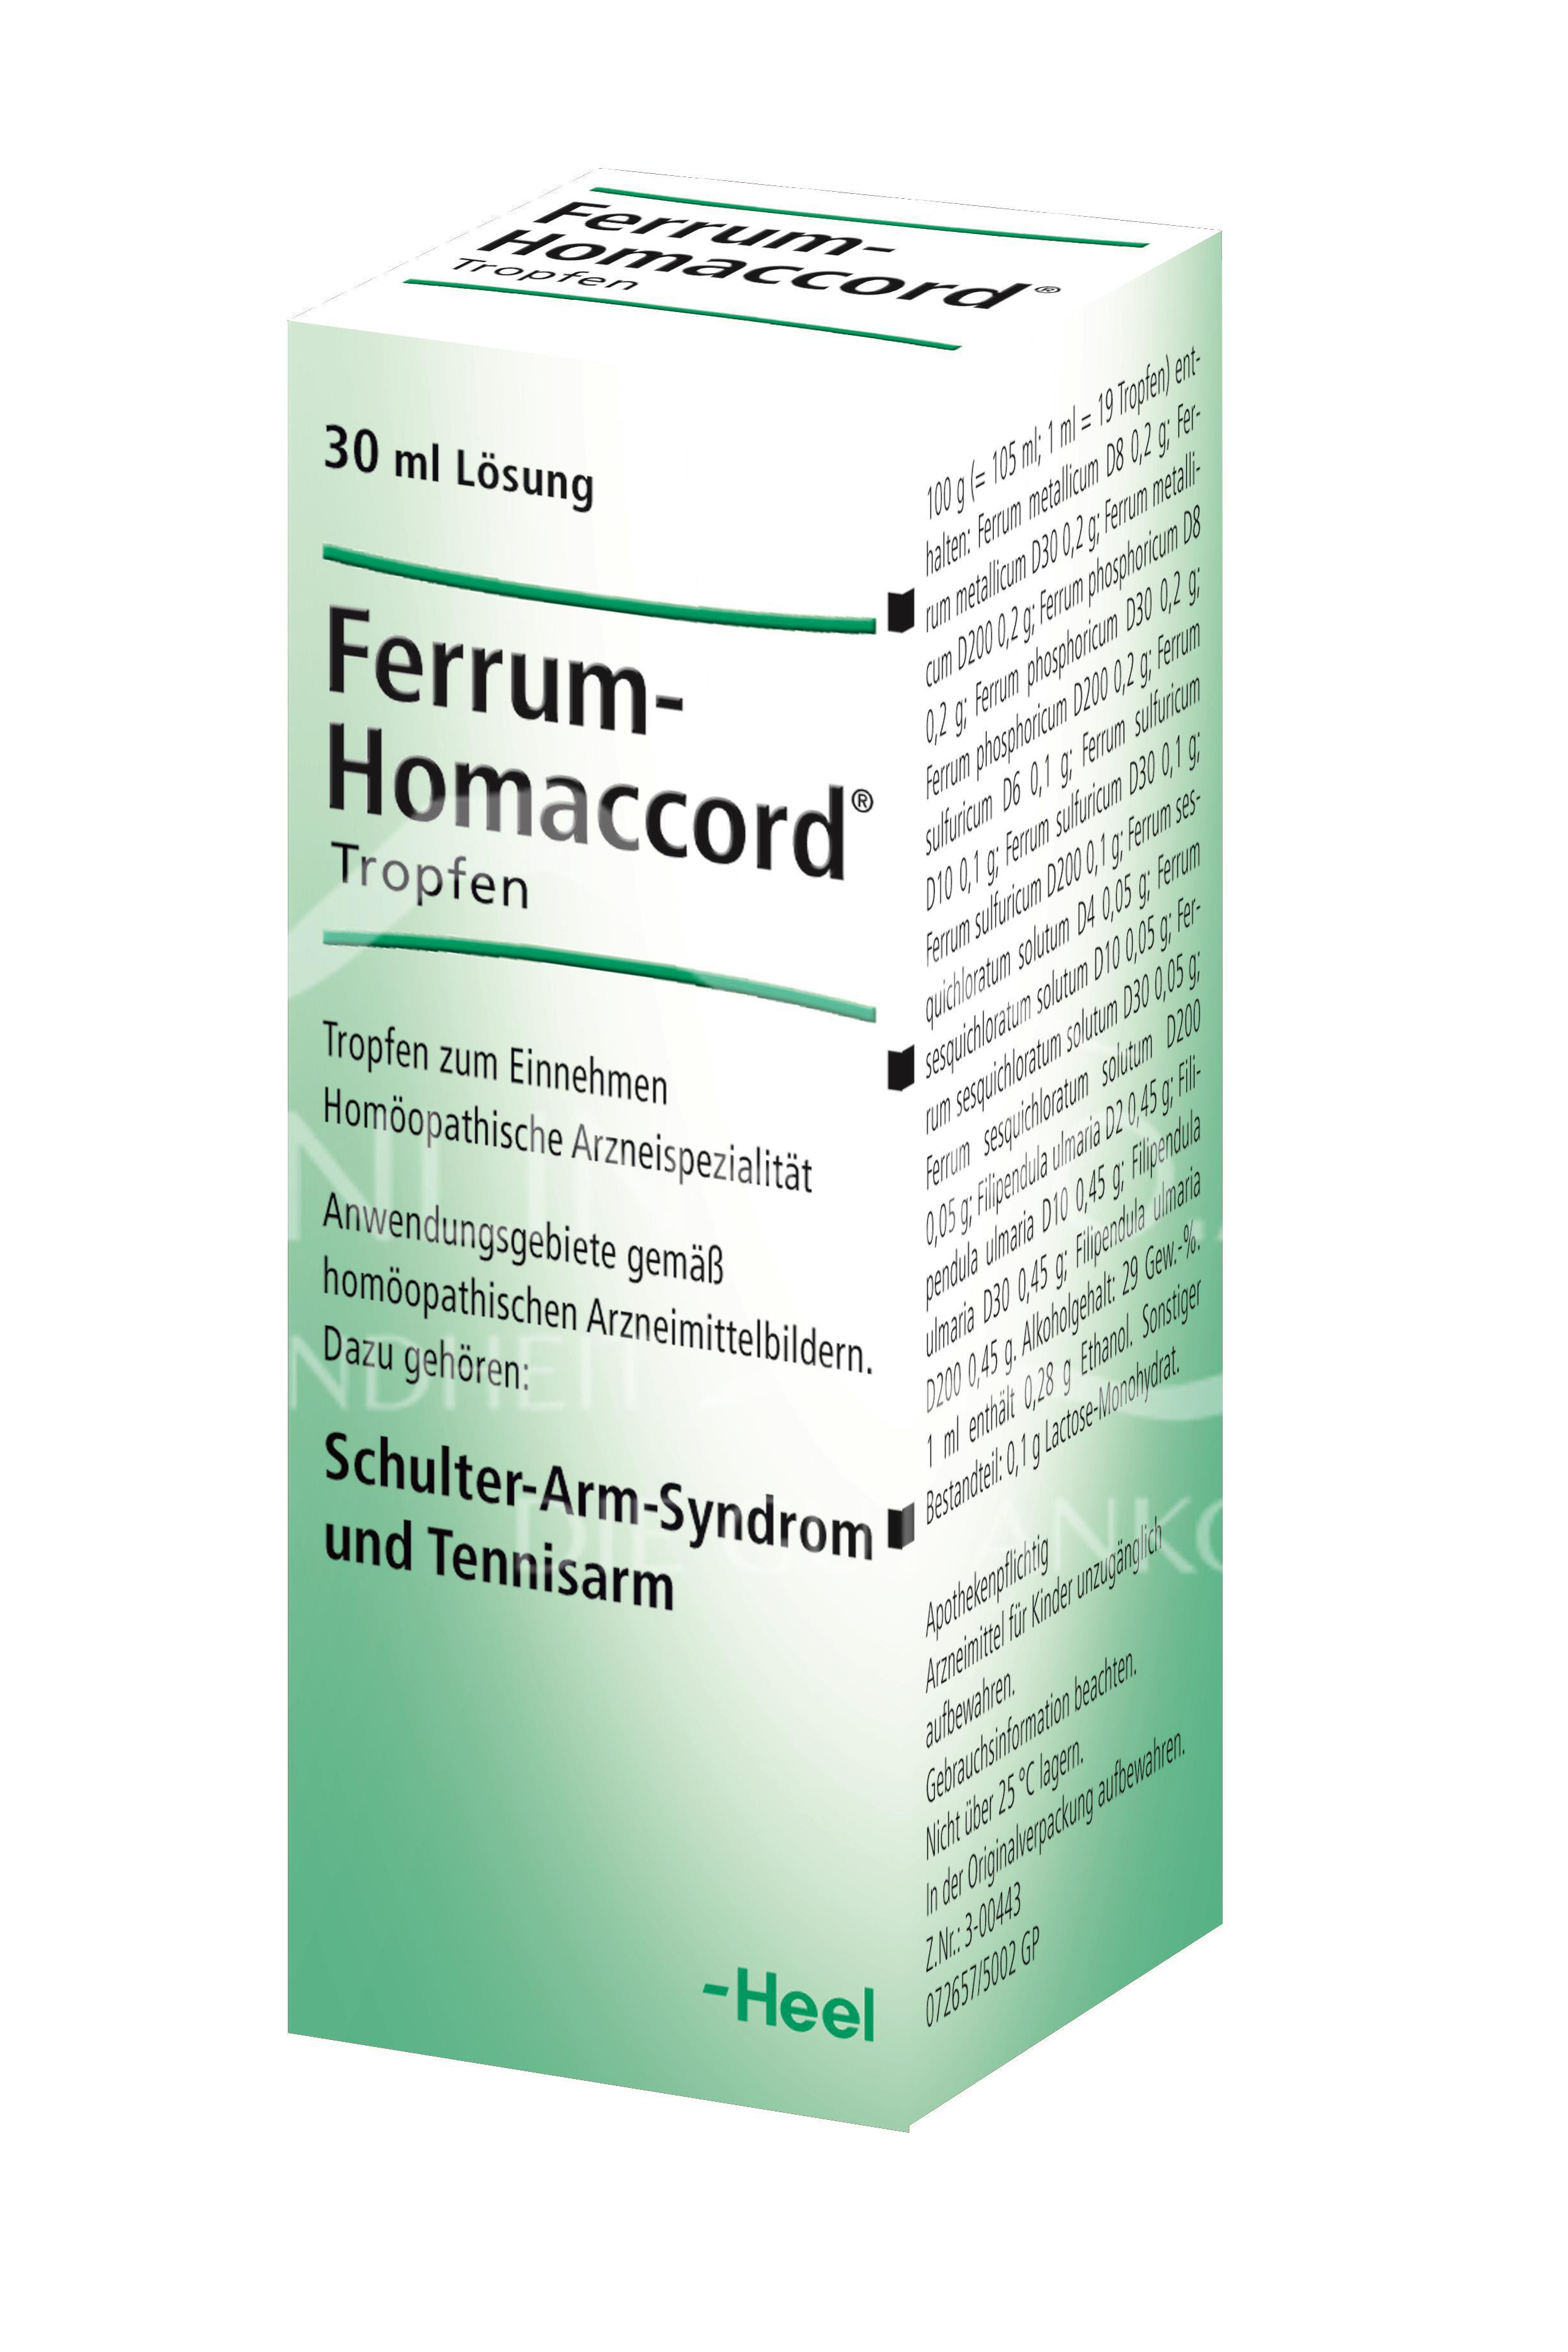 Ferrum-Homaccord®